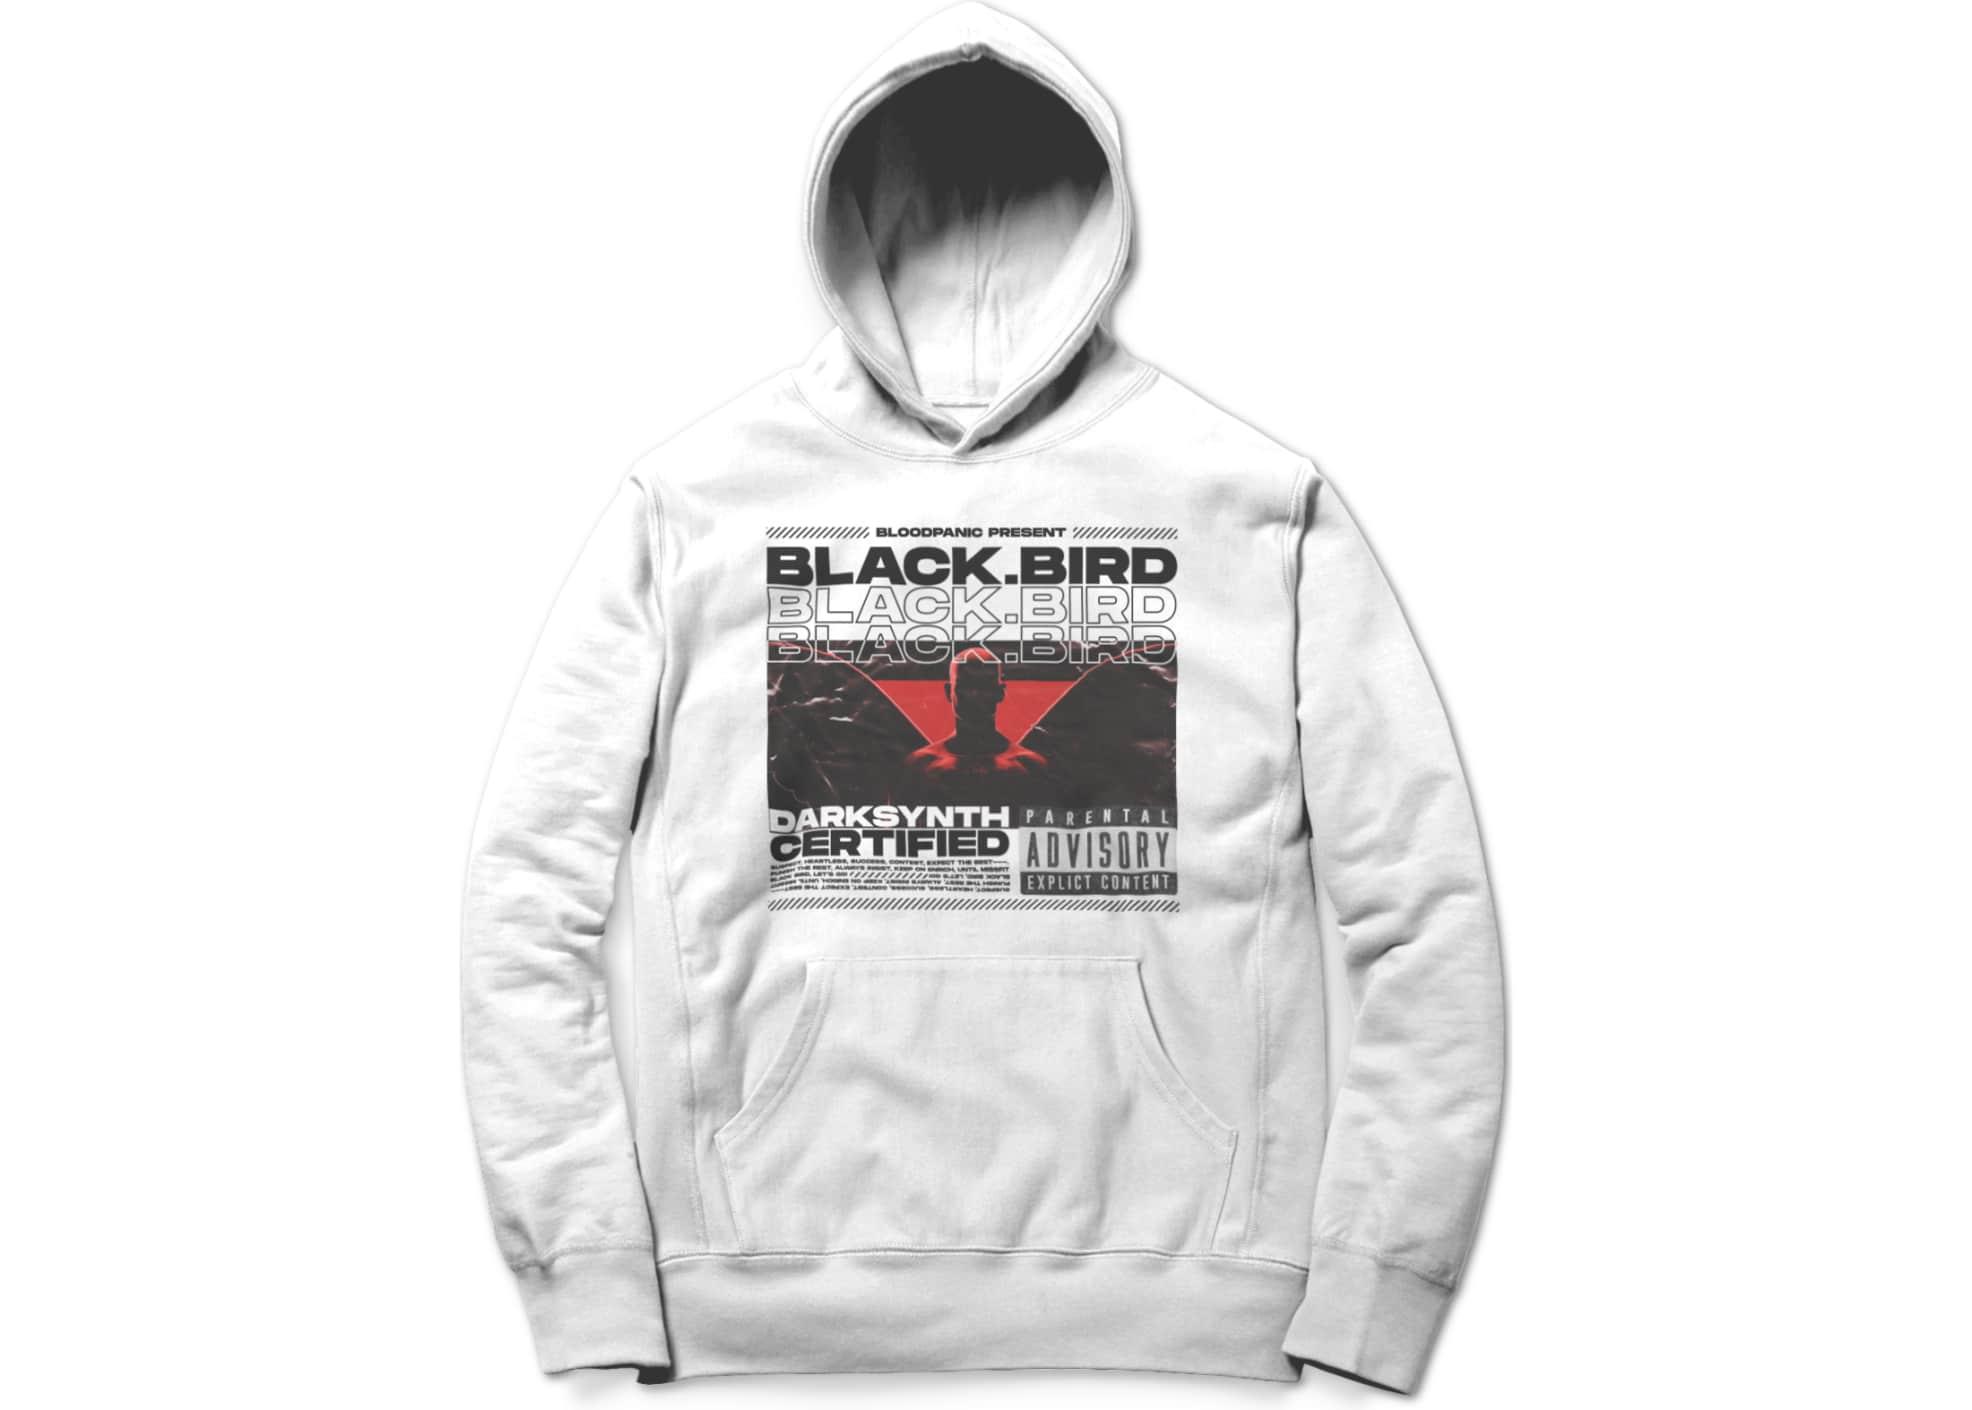 Bloodpanic black bird heavy   white 1622842712